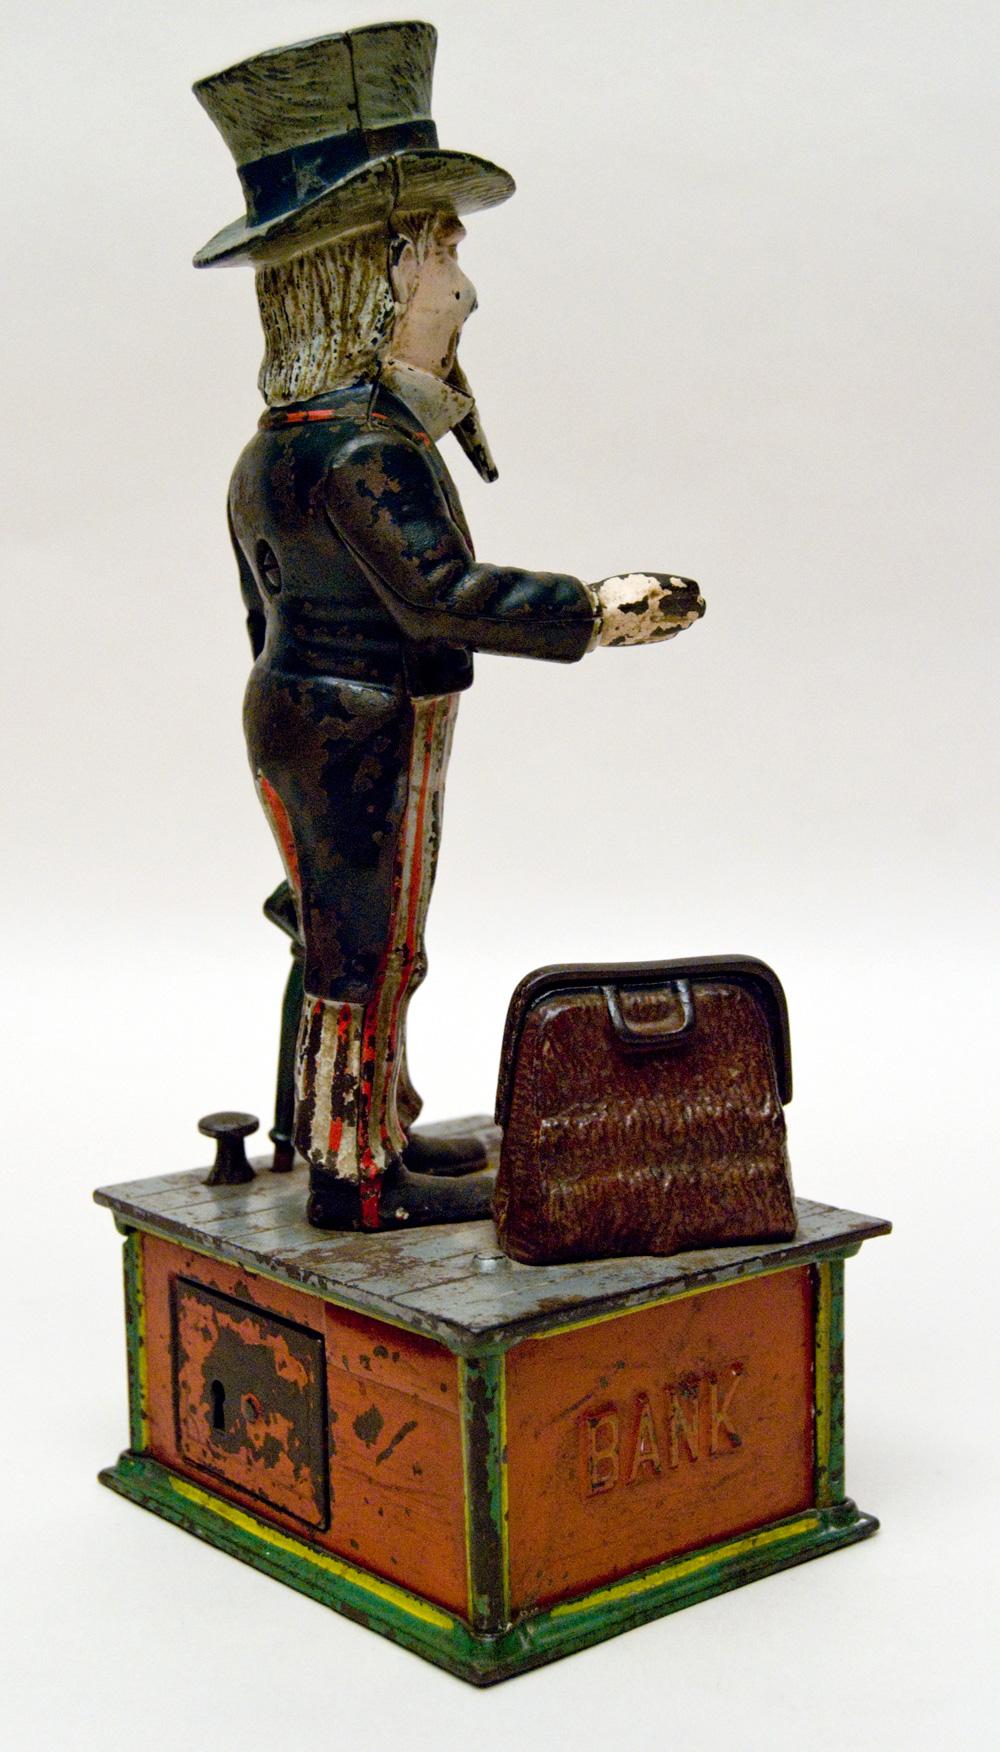 vintage mechanical banks